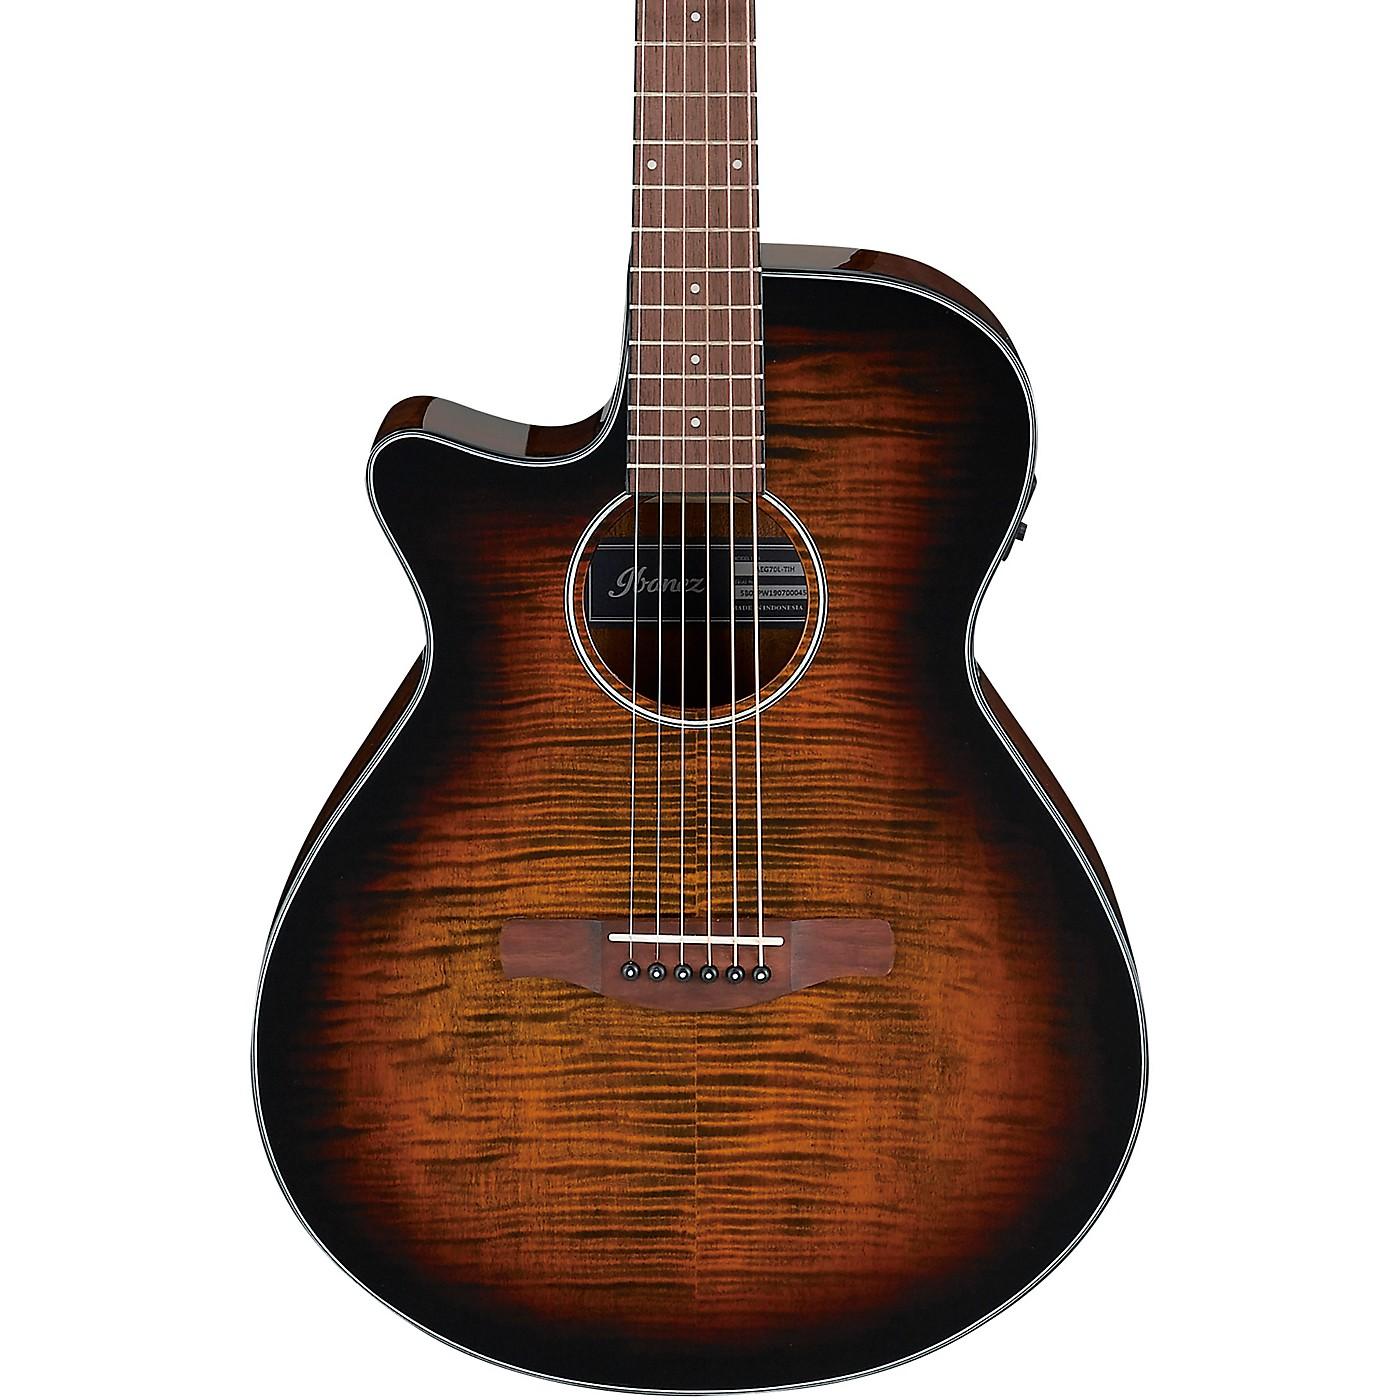 Ibanez AEG70L AEG Left-Handed Grand Concert Acoustic-Electric Guitar thumbnail